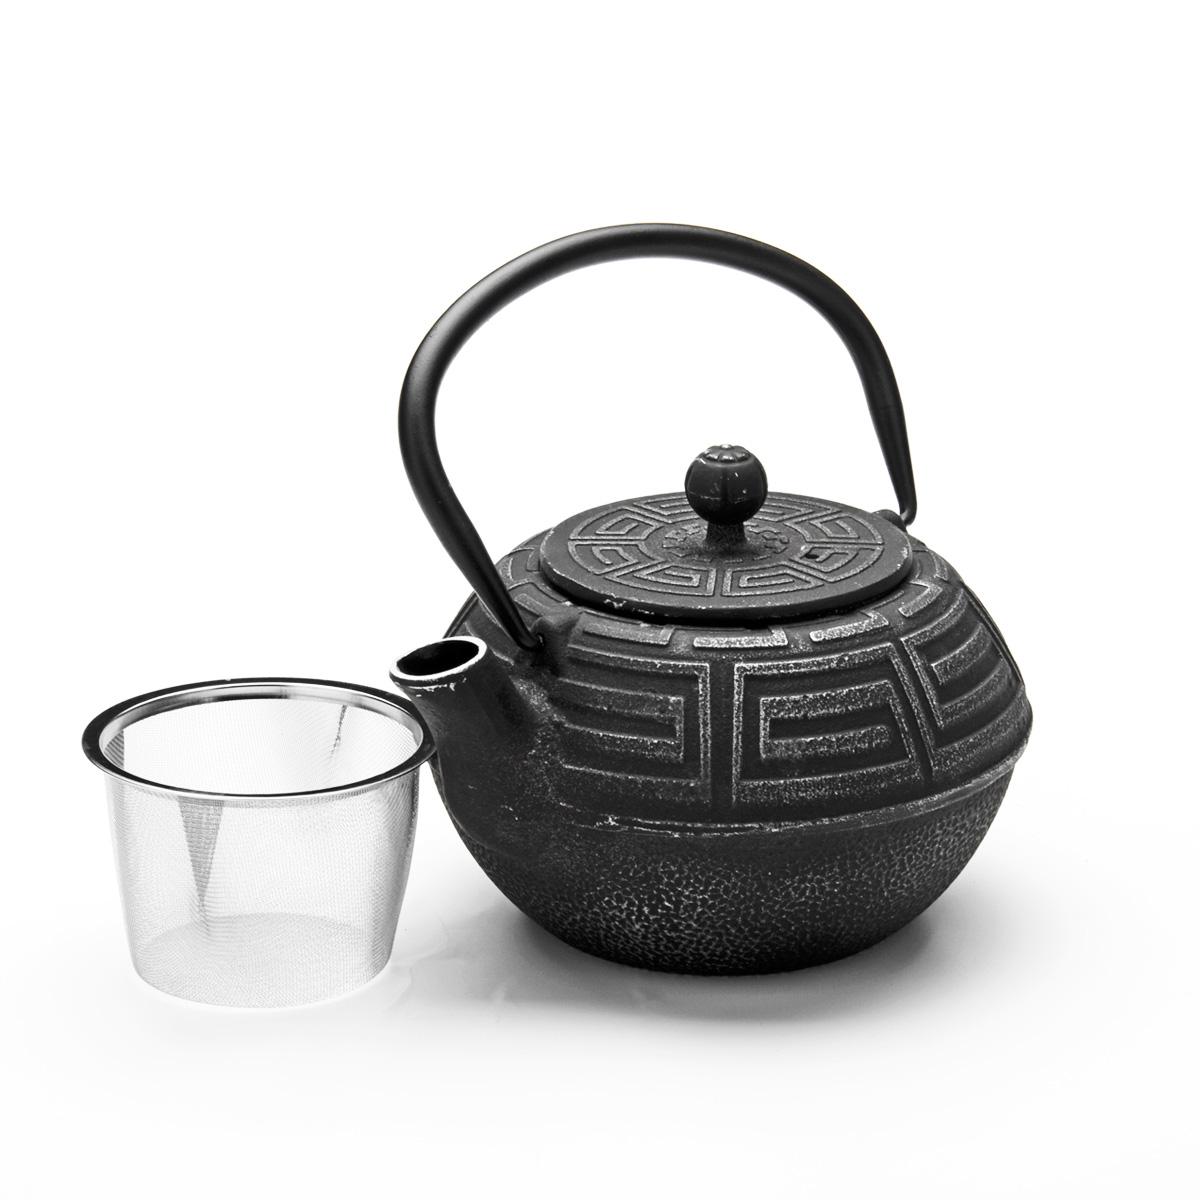 Чайник заварочный Mayer & Boch, чугунный, 1,5 л